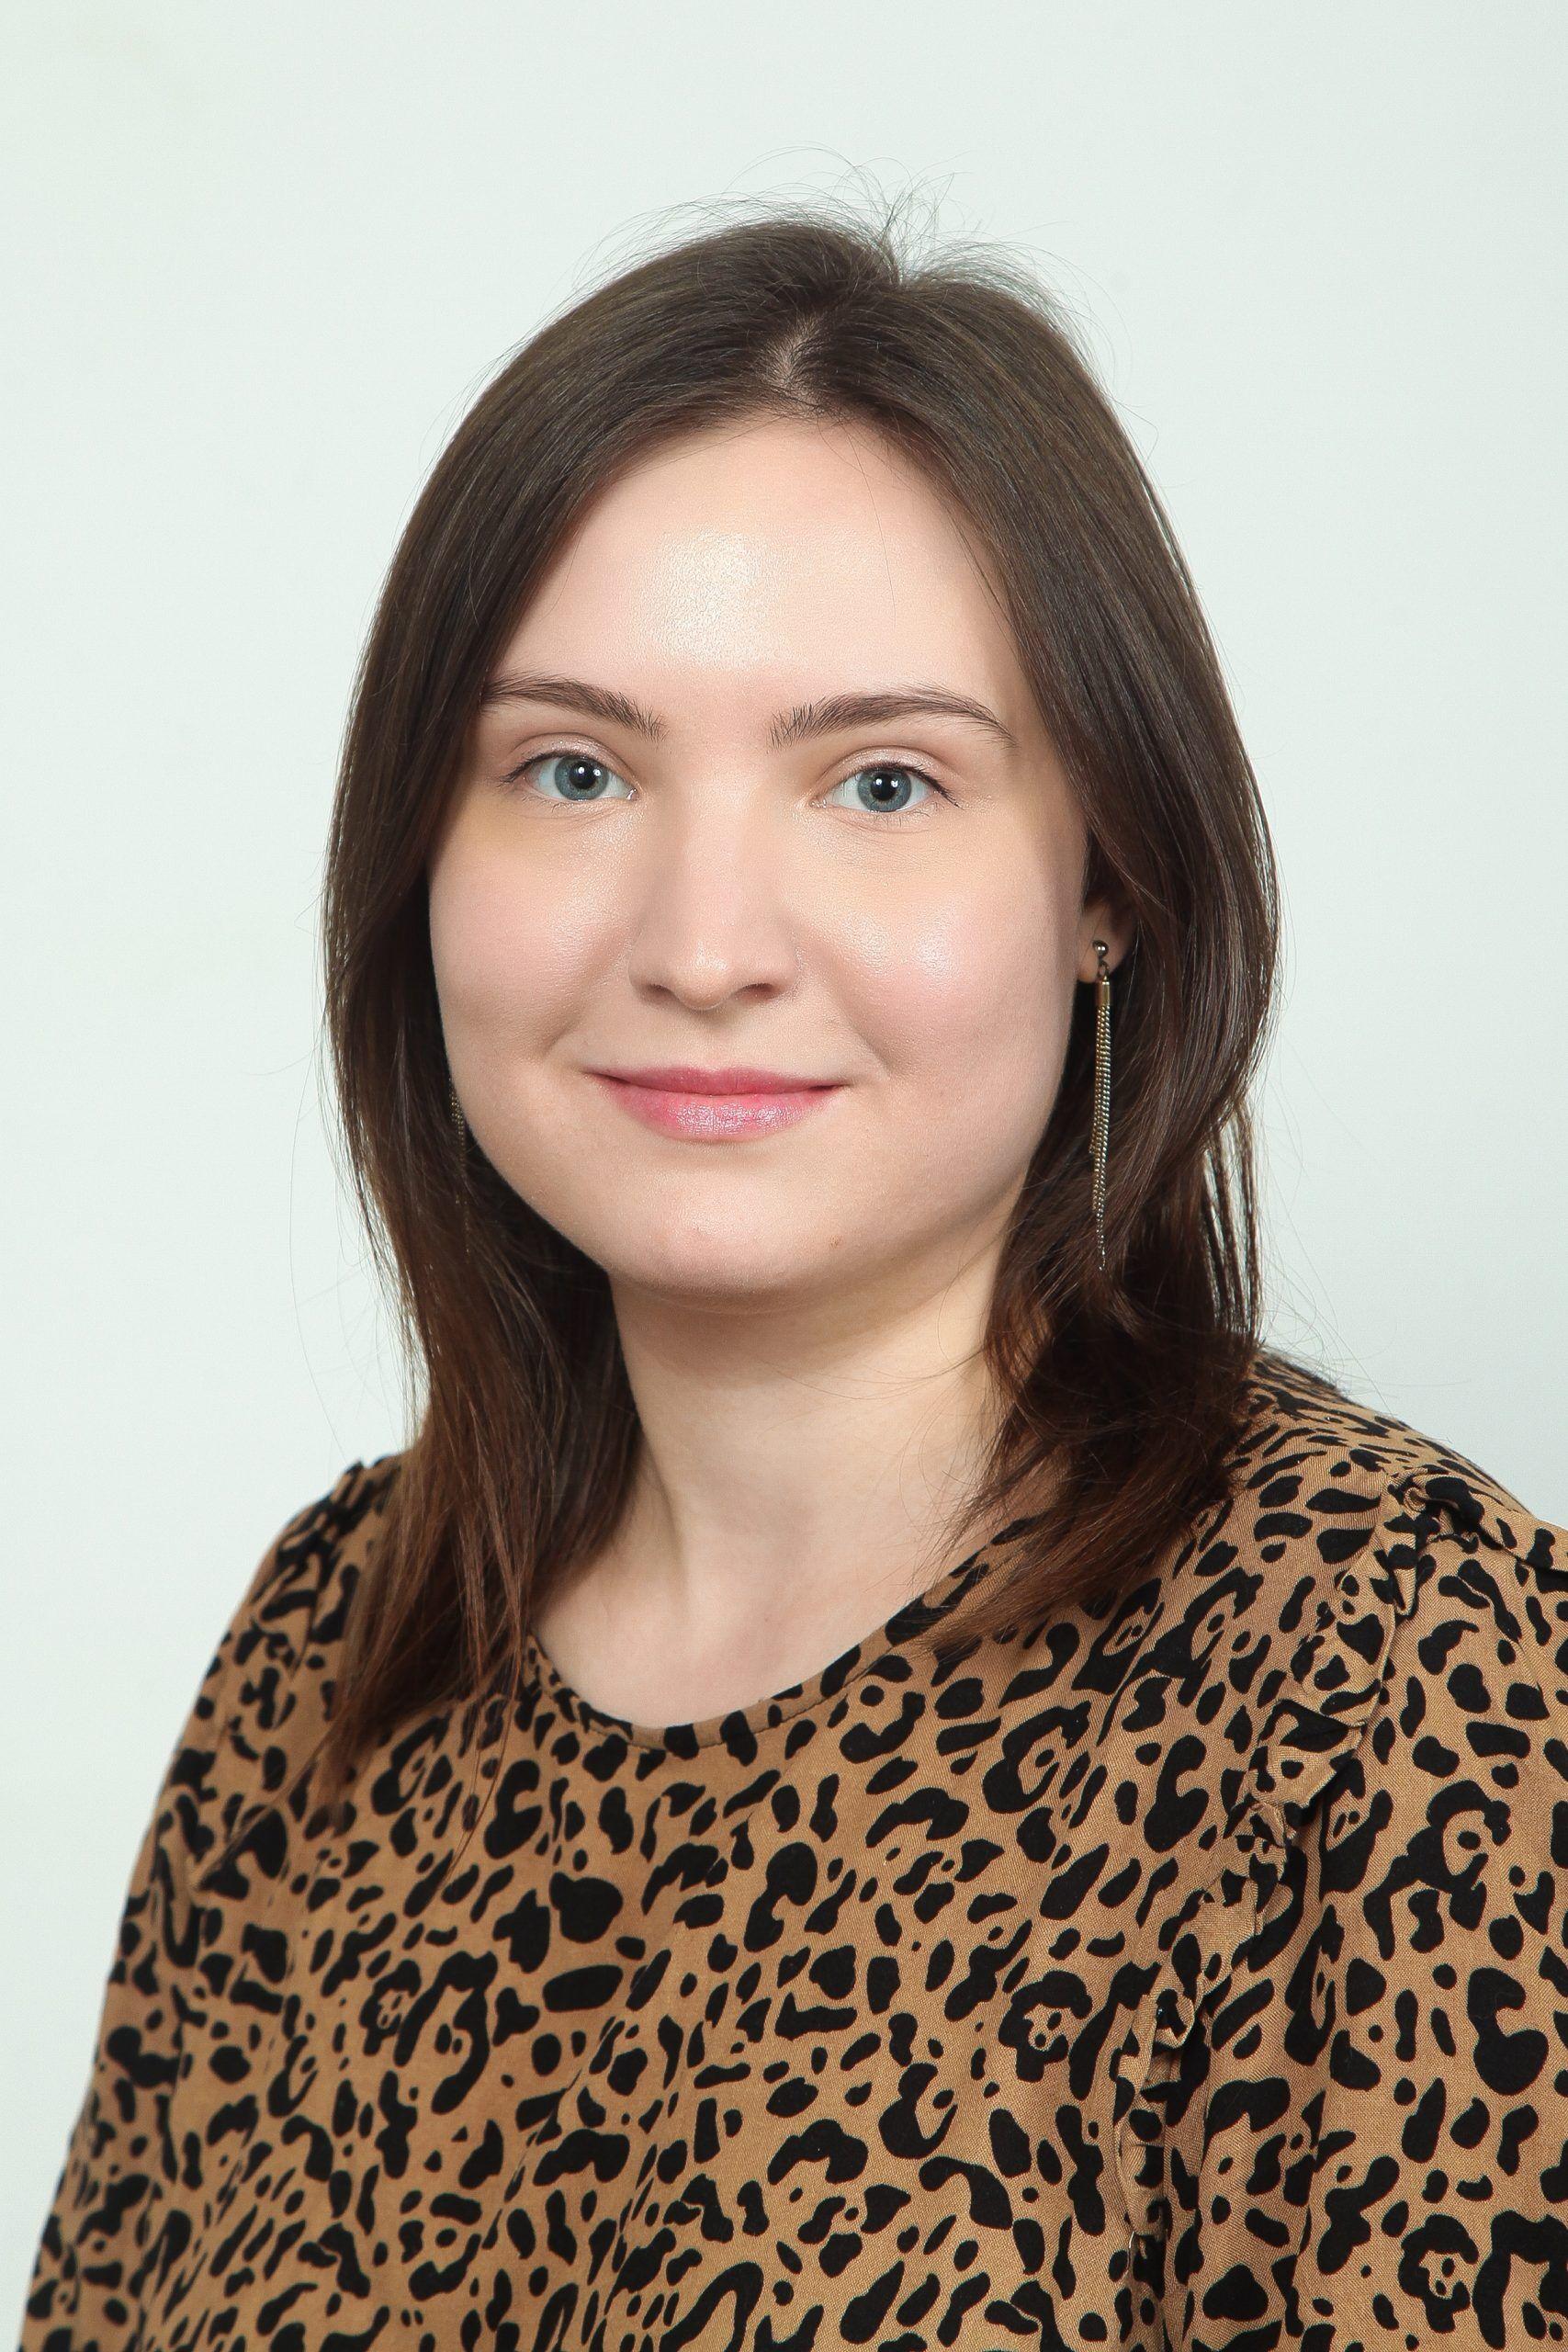 Jelena Reshetnikova